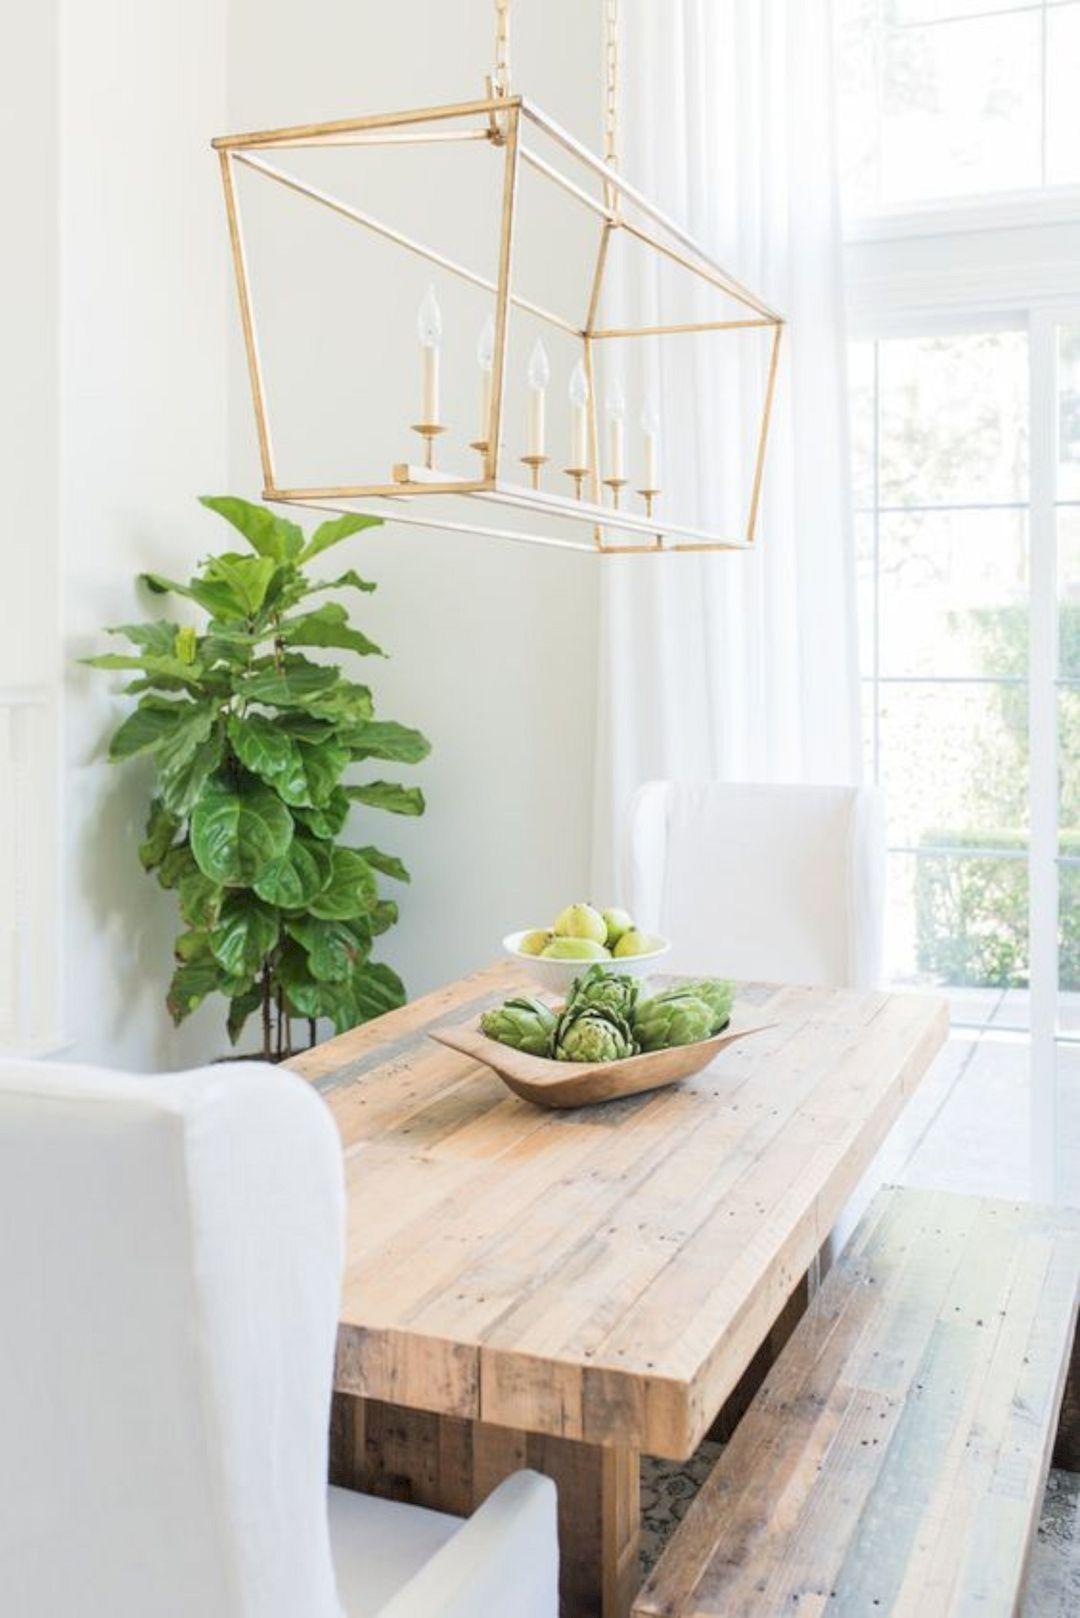 16 homemade interior design ideas https www futuristarchitecture com 30979